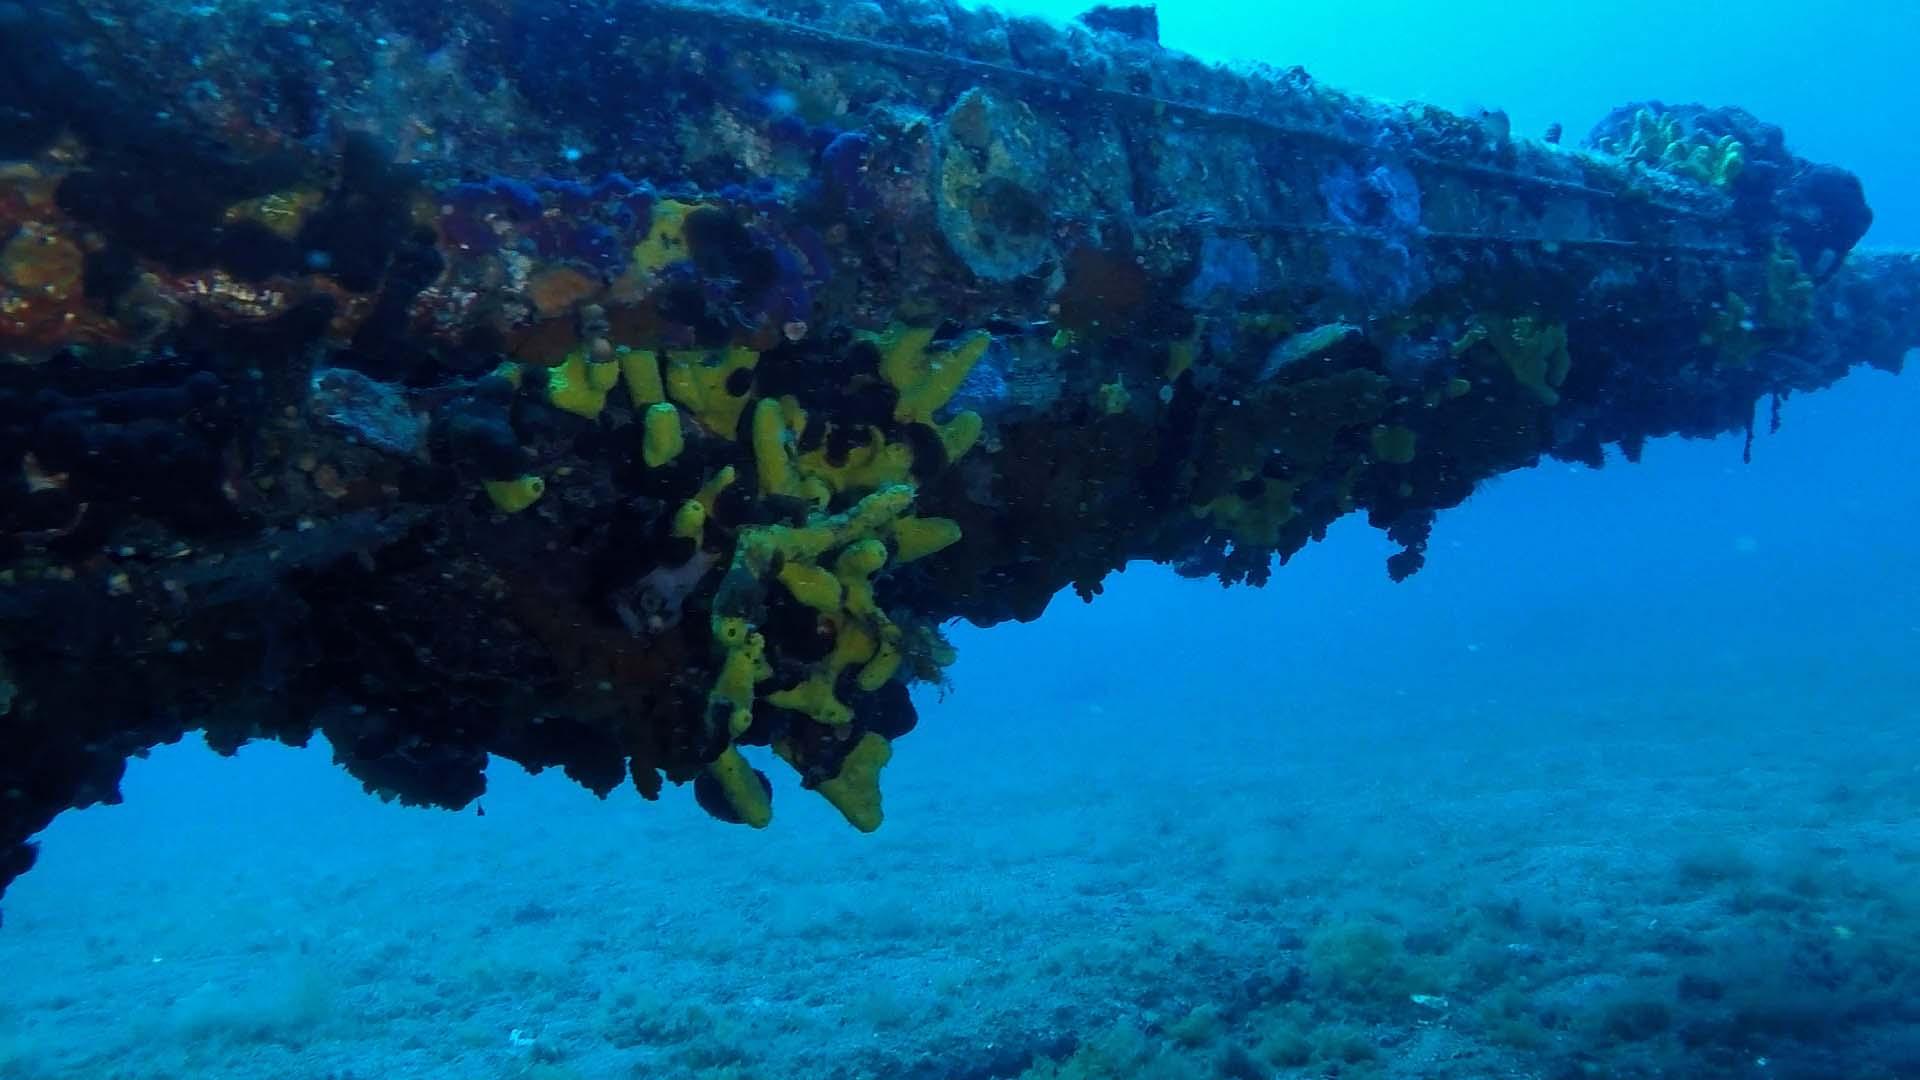 Junker 88 di Santa Caterina ala destra